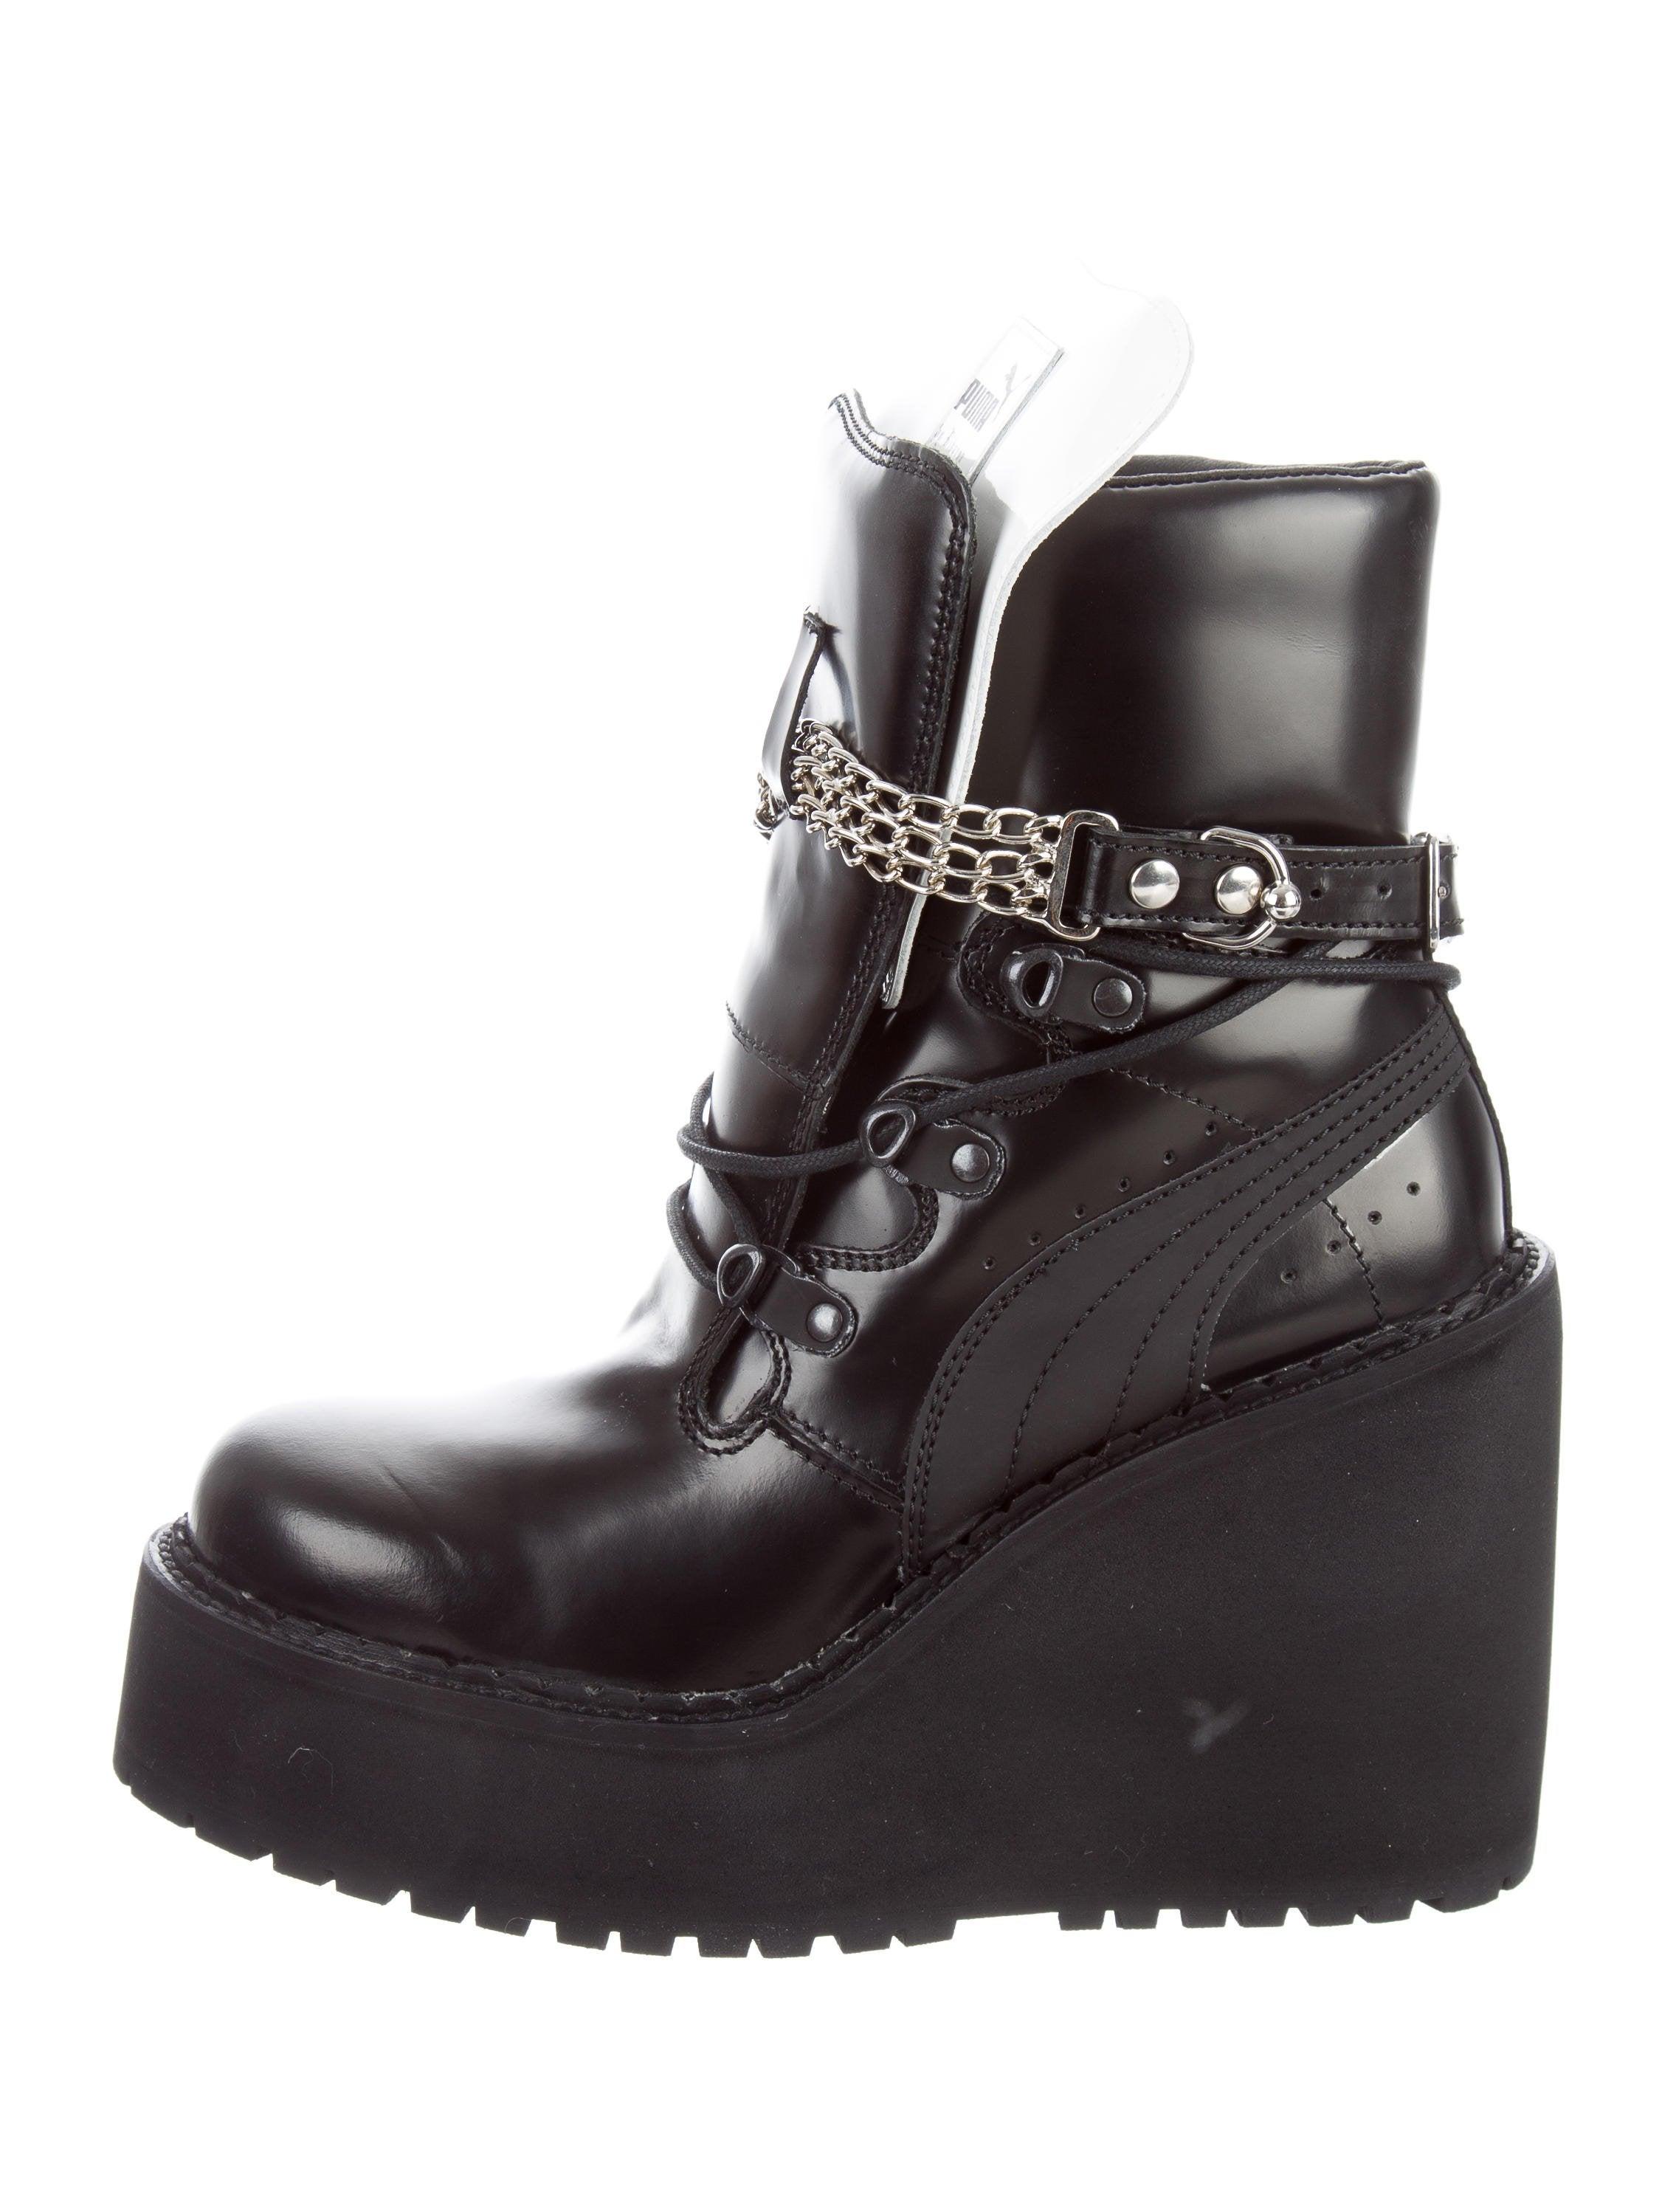 sale amazon online cheap price Fenty x Puma Chain-Link Wedge Boots w/ Tags JuLz04SO